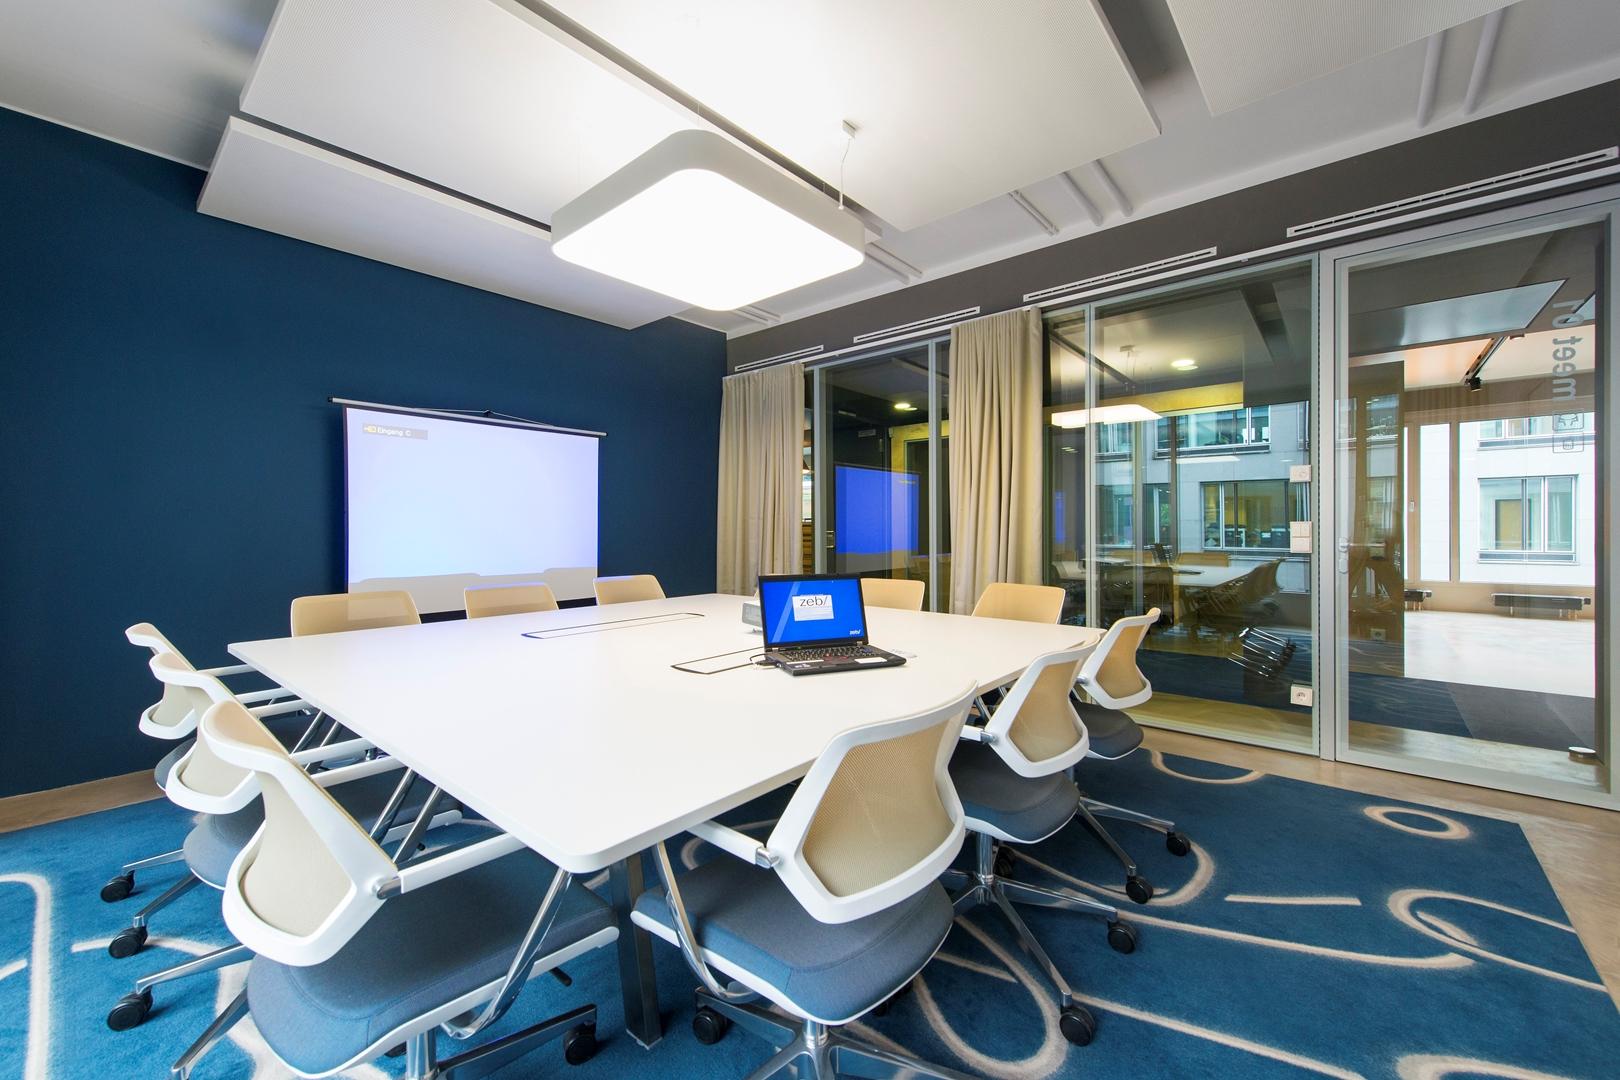 18_ZEB Munich_Meet and Exchange_Team meeting room (Copy)